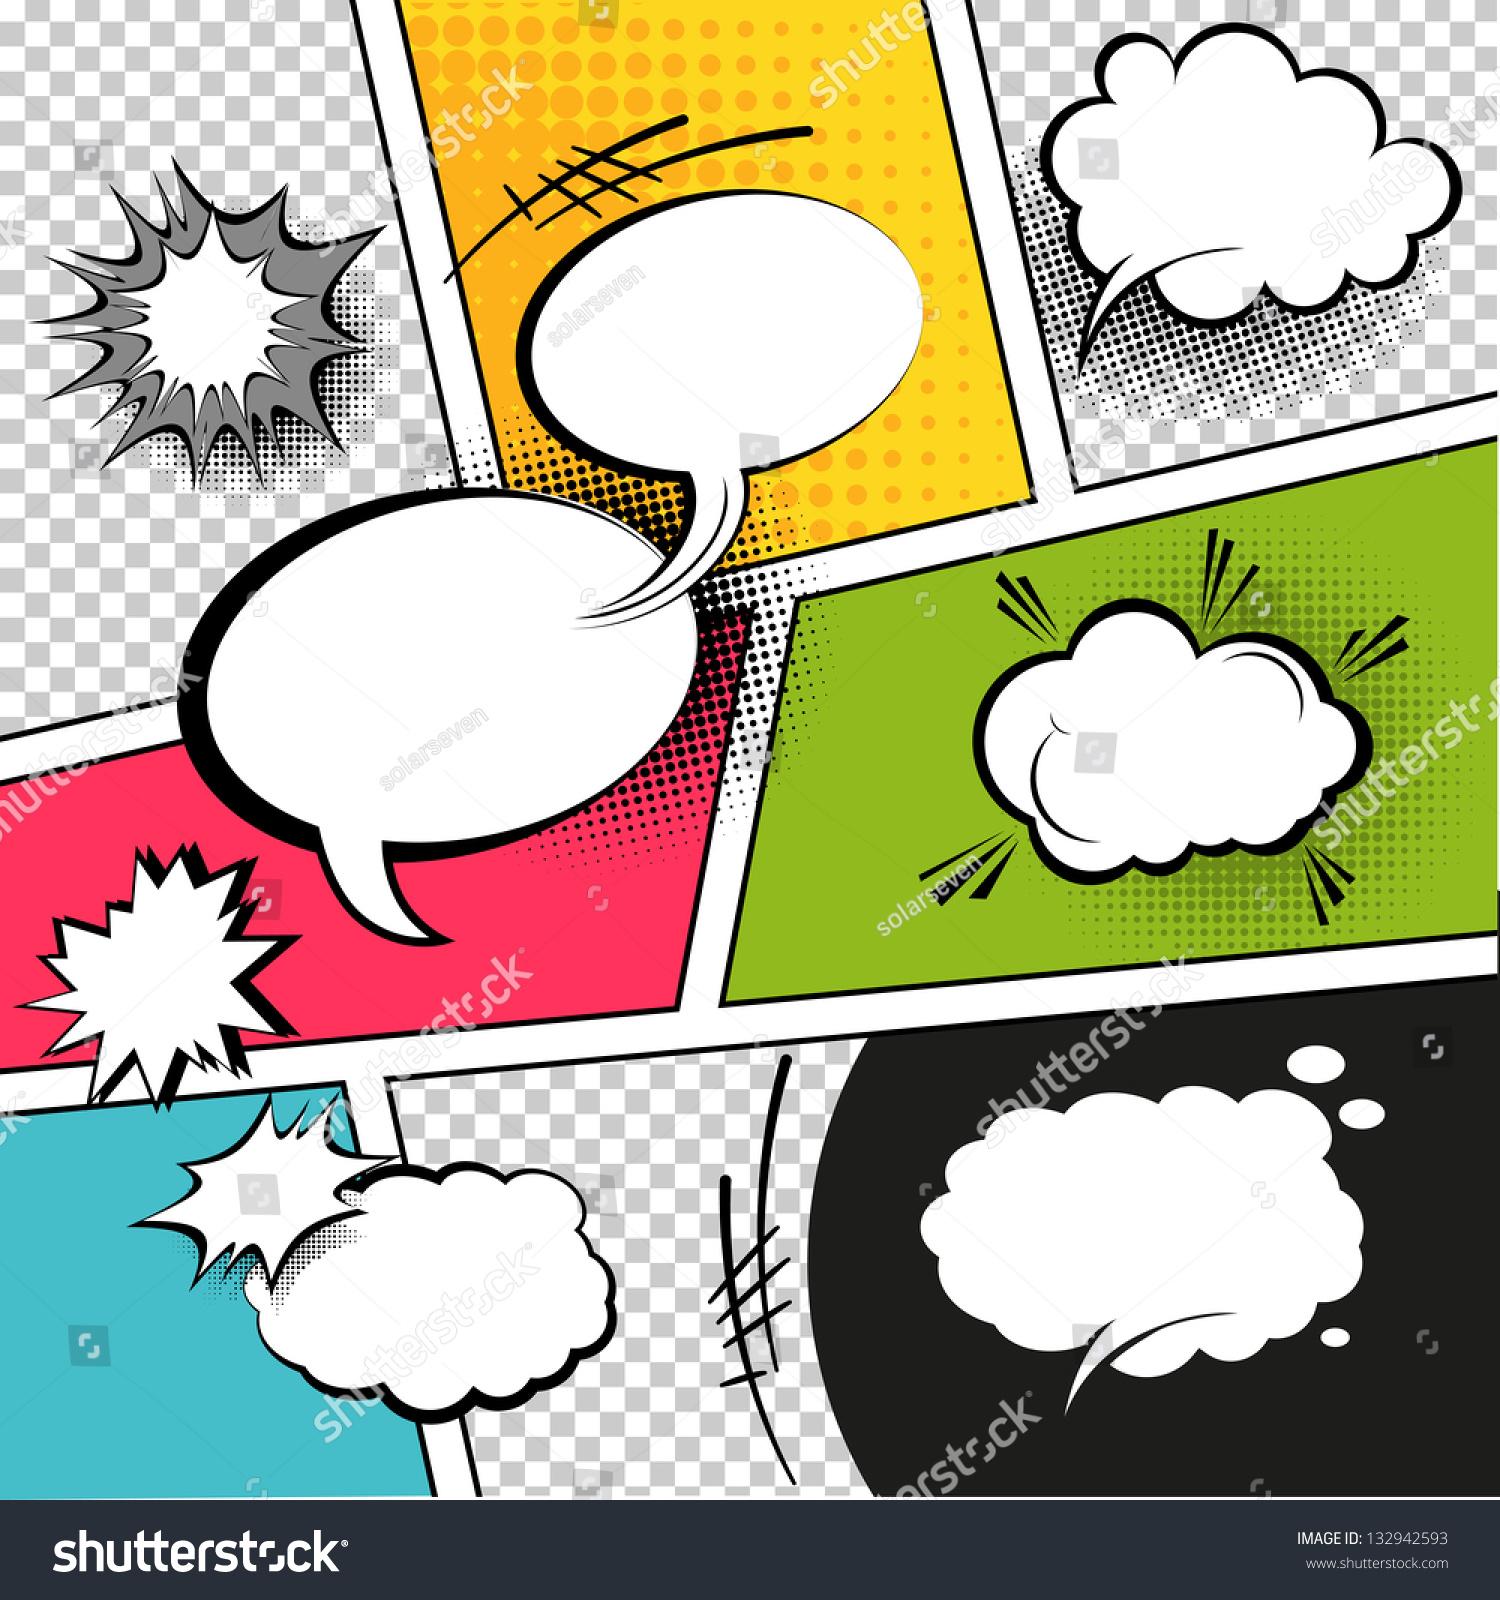 comic speech bubbles on comic strip stock vector 132942593 shutterstock. Black Bedroom Furniture Sets. Home Design Ideas